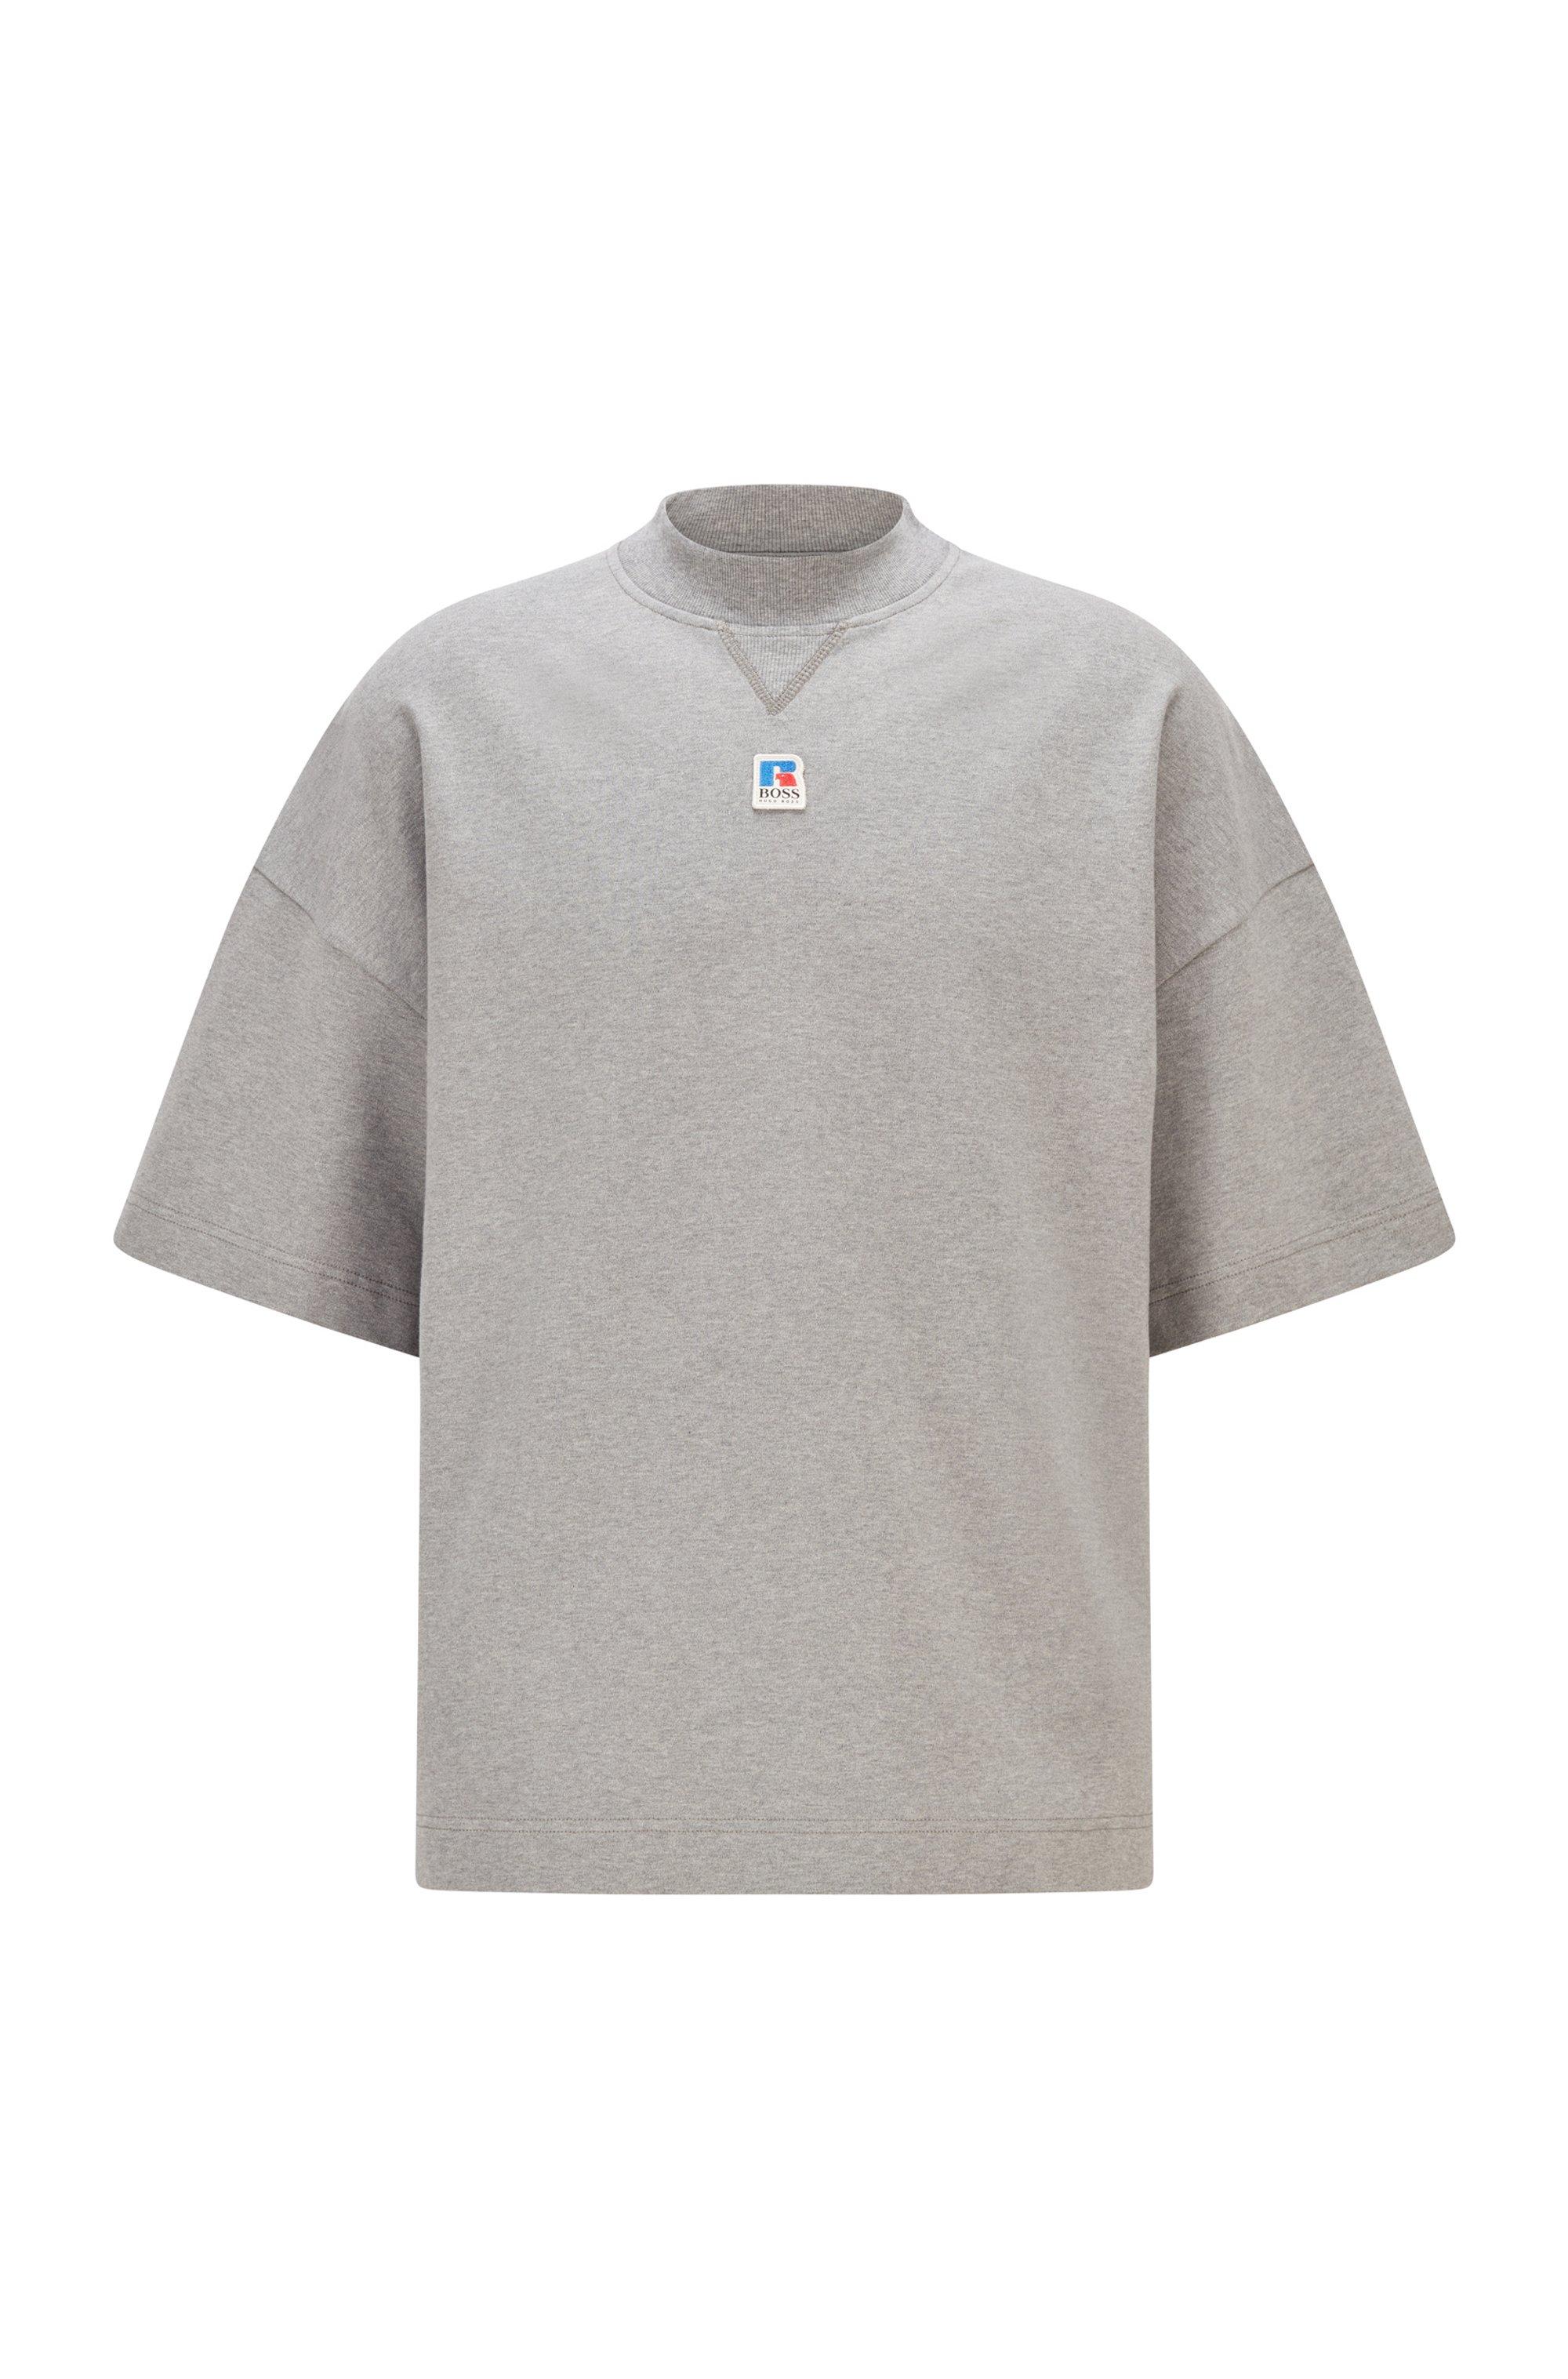 Camiseta unisex relaxed fit en algodón orgánico con logo exclusivo, Gris